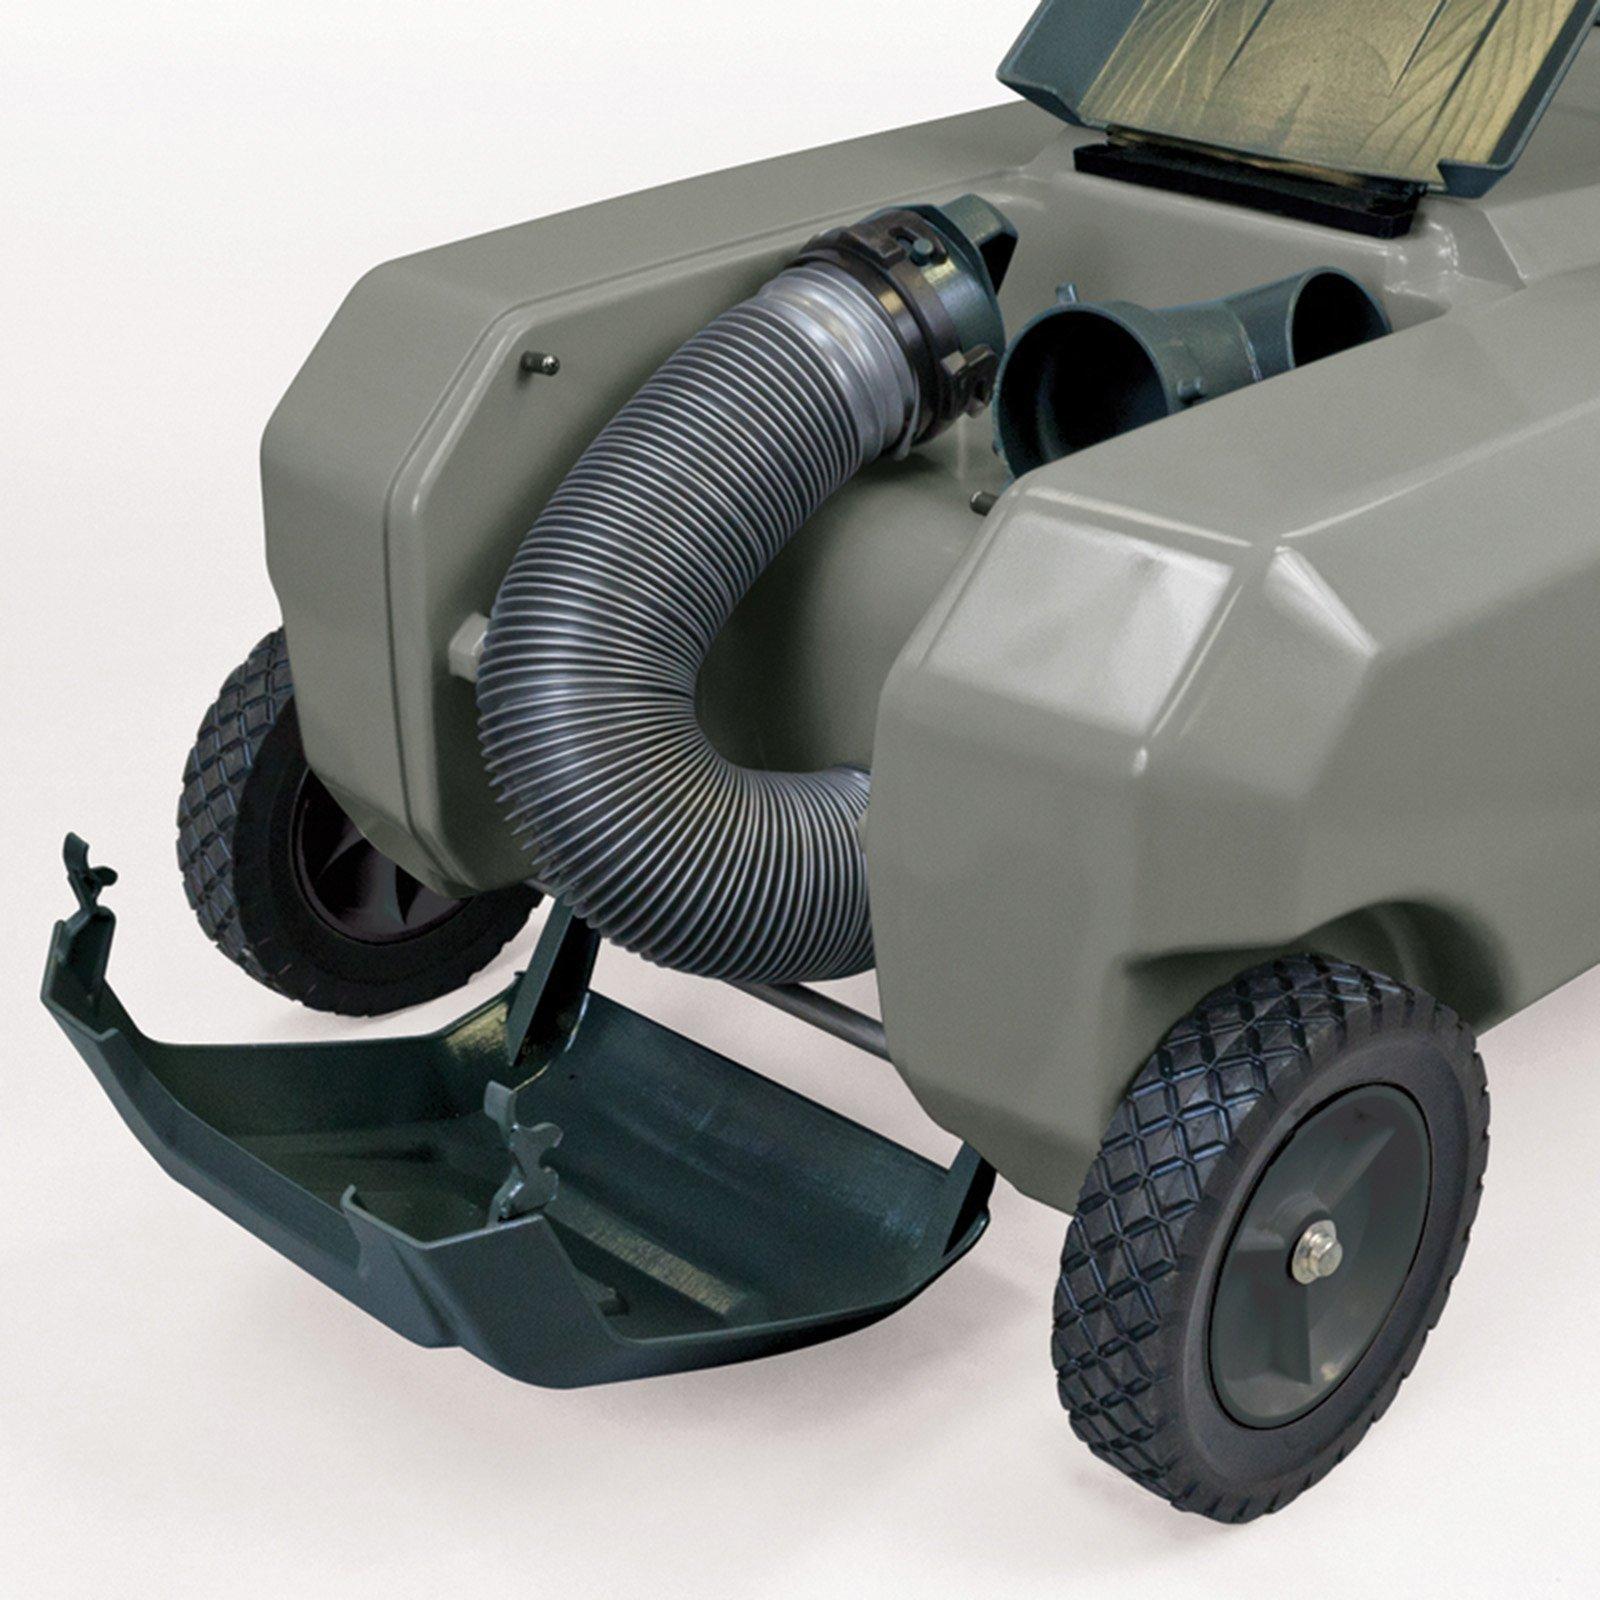 SmartTote2 40518 LX Portable RV Waste Tote Tank-4 Wheels-27 Gallons-Thetford-40518 by SmartTote2 (Image #2)